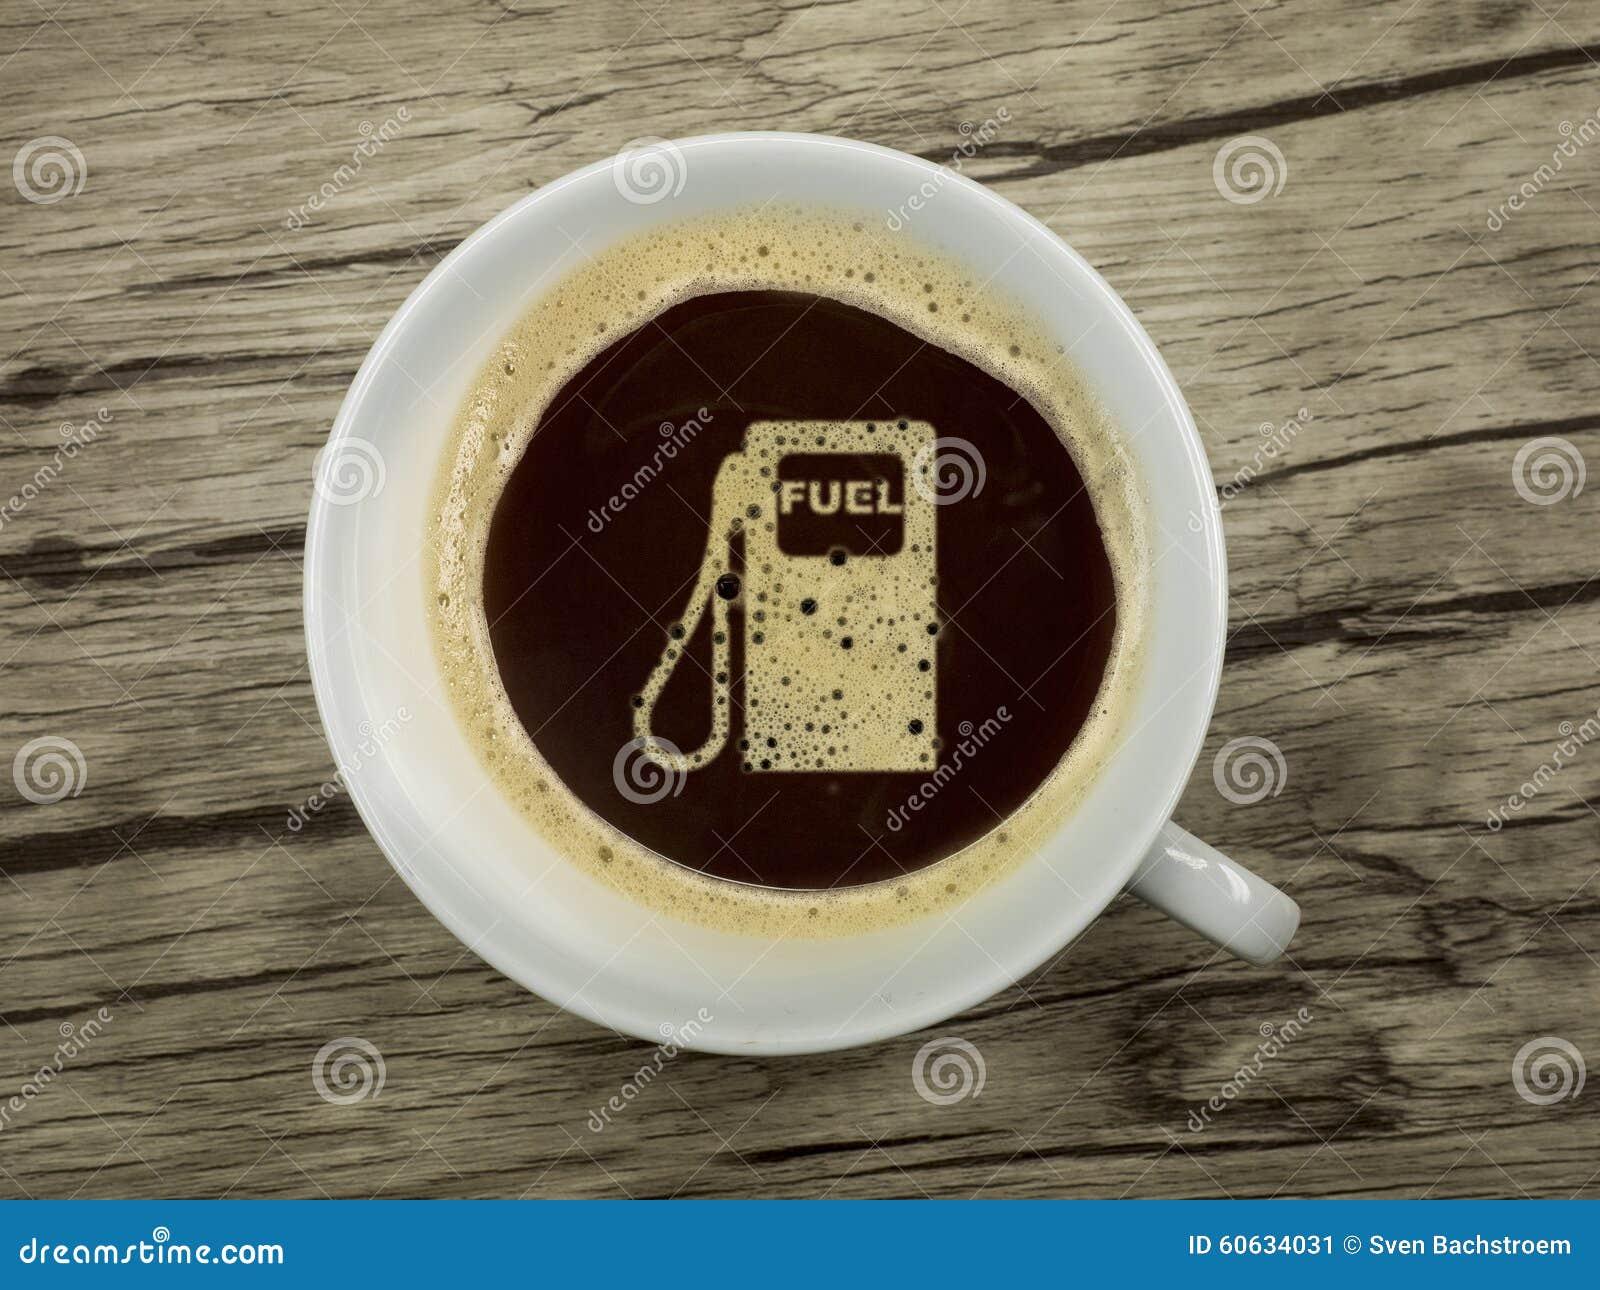 Tankstelle bietet Kaffee an